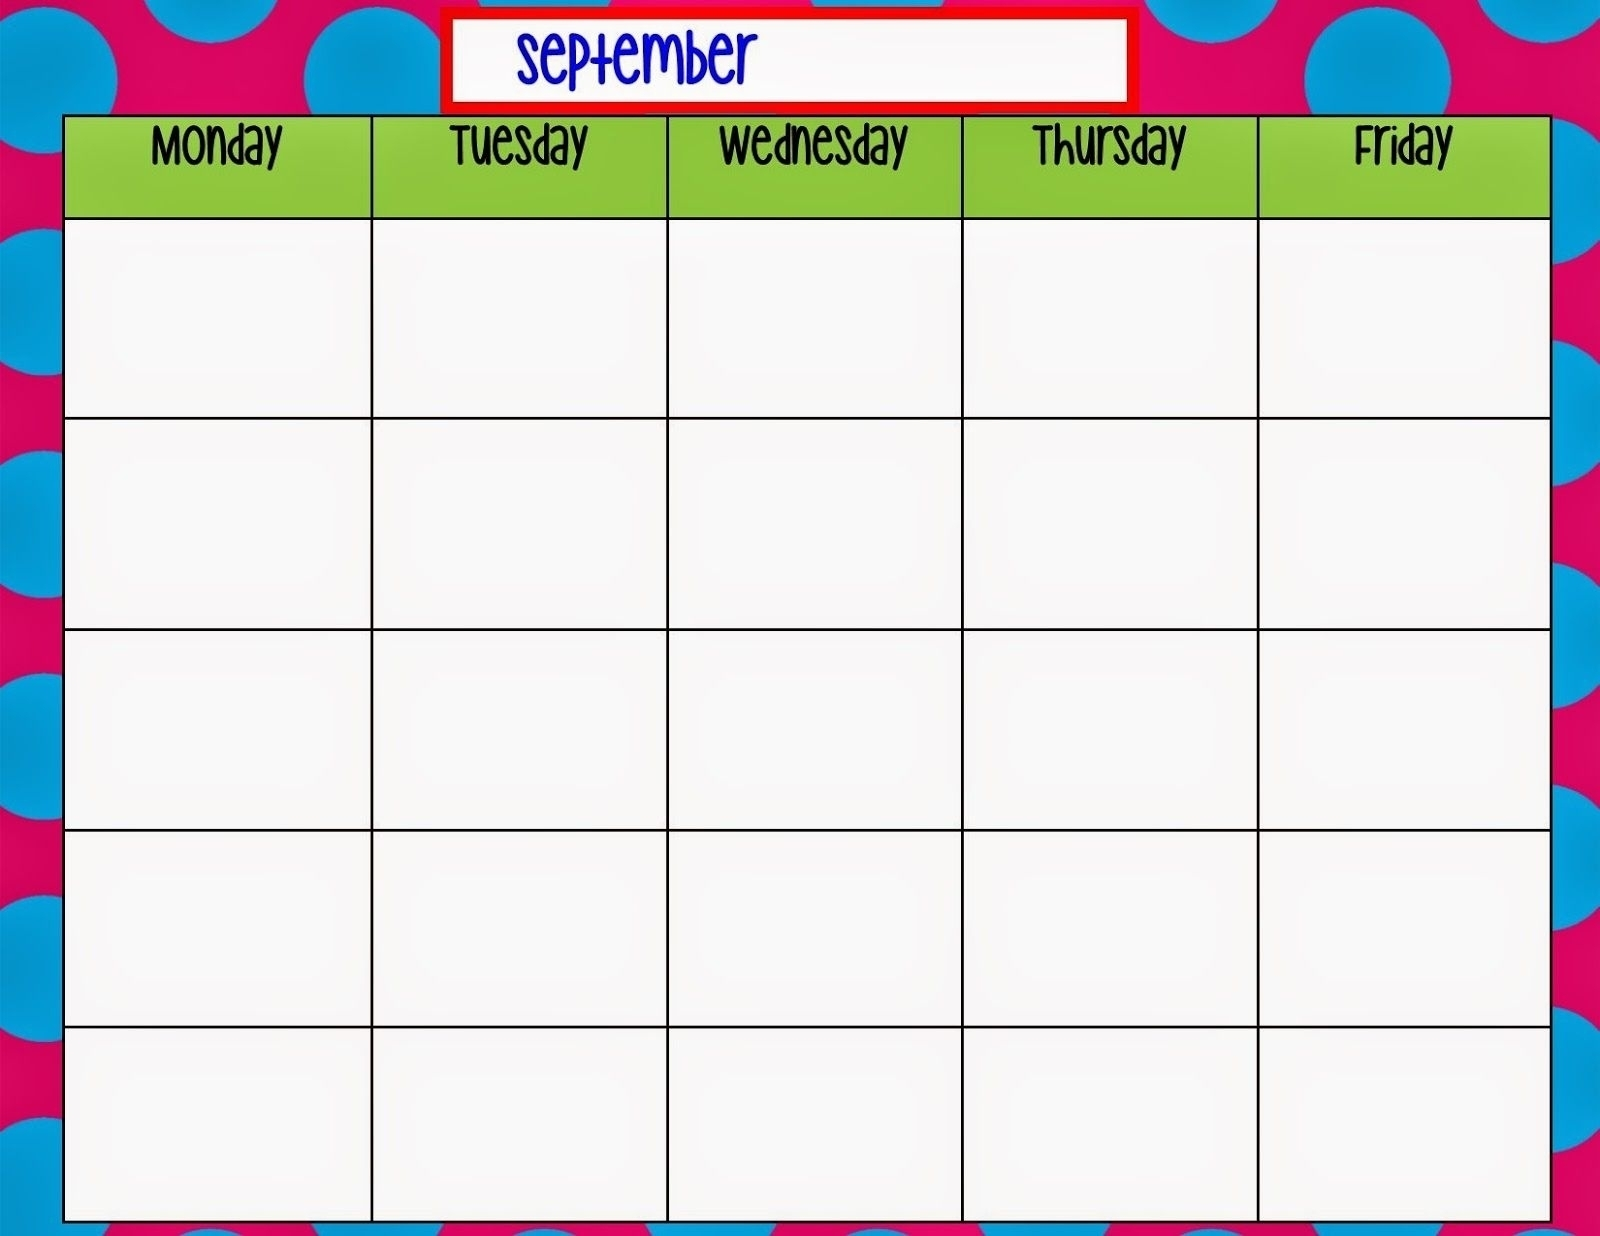 Free Printable Weekly Calendar Monday To Friday – Template Calendar Design